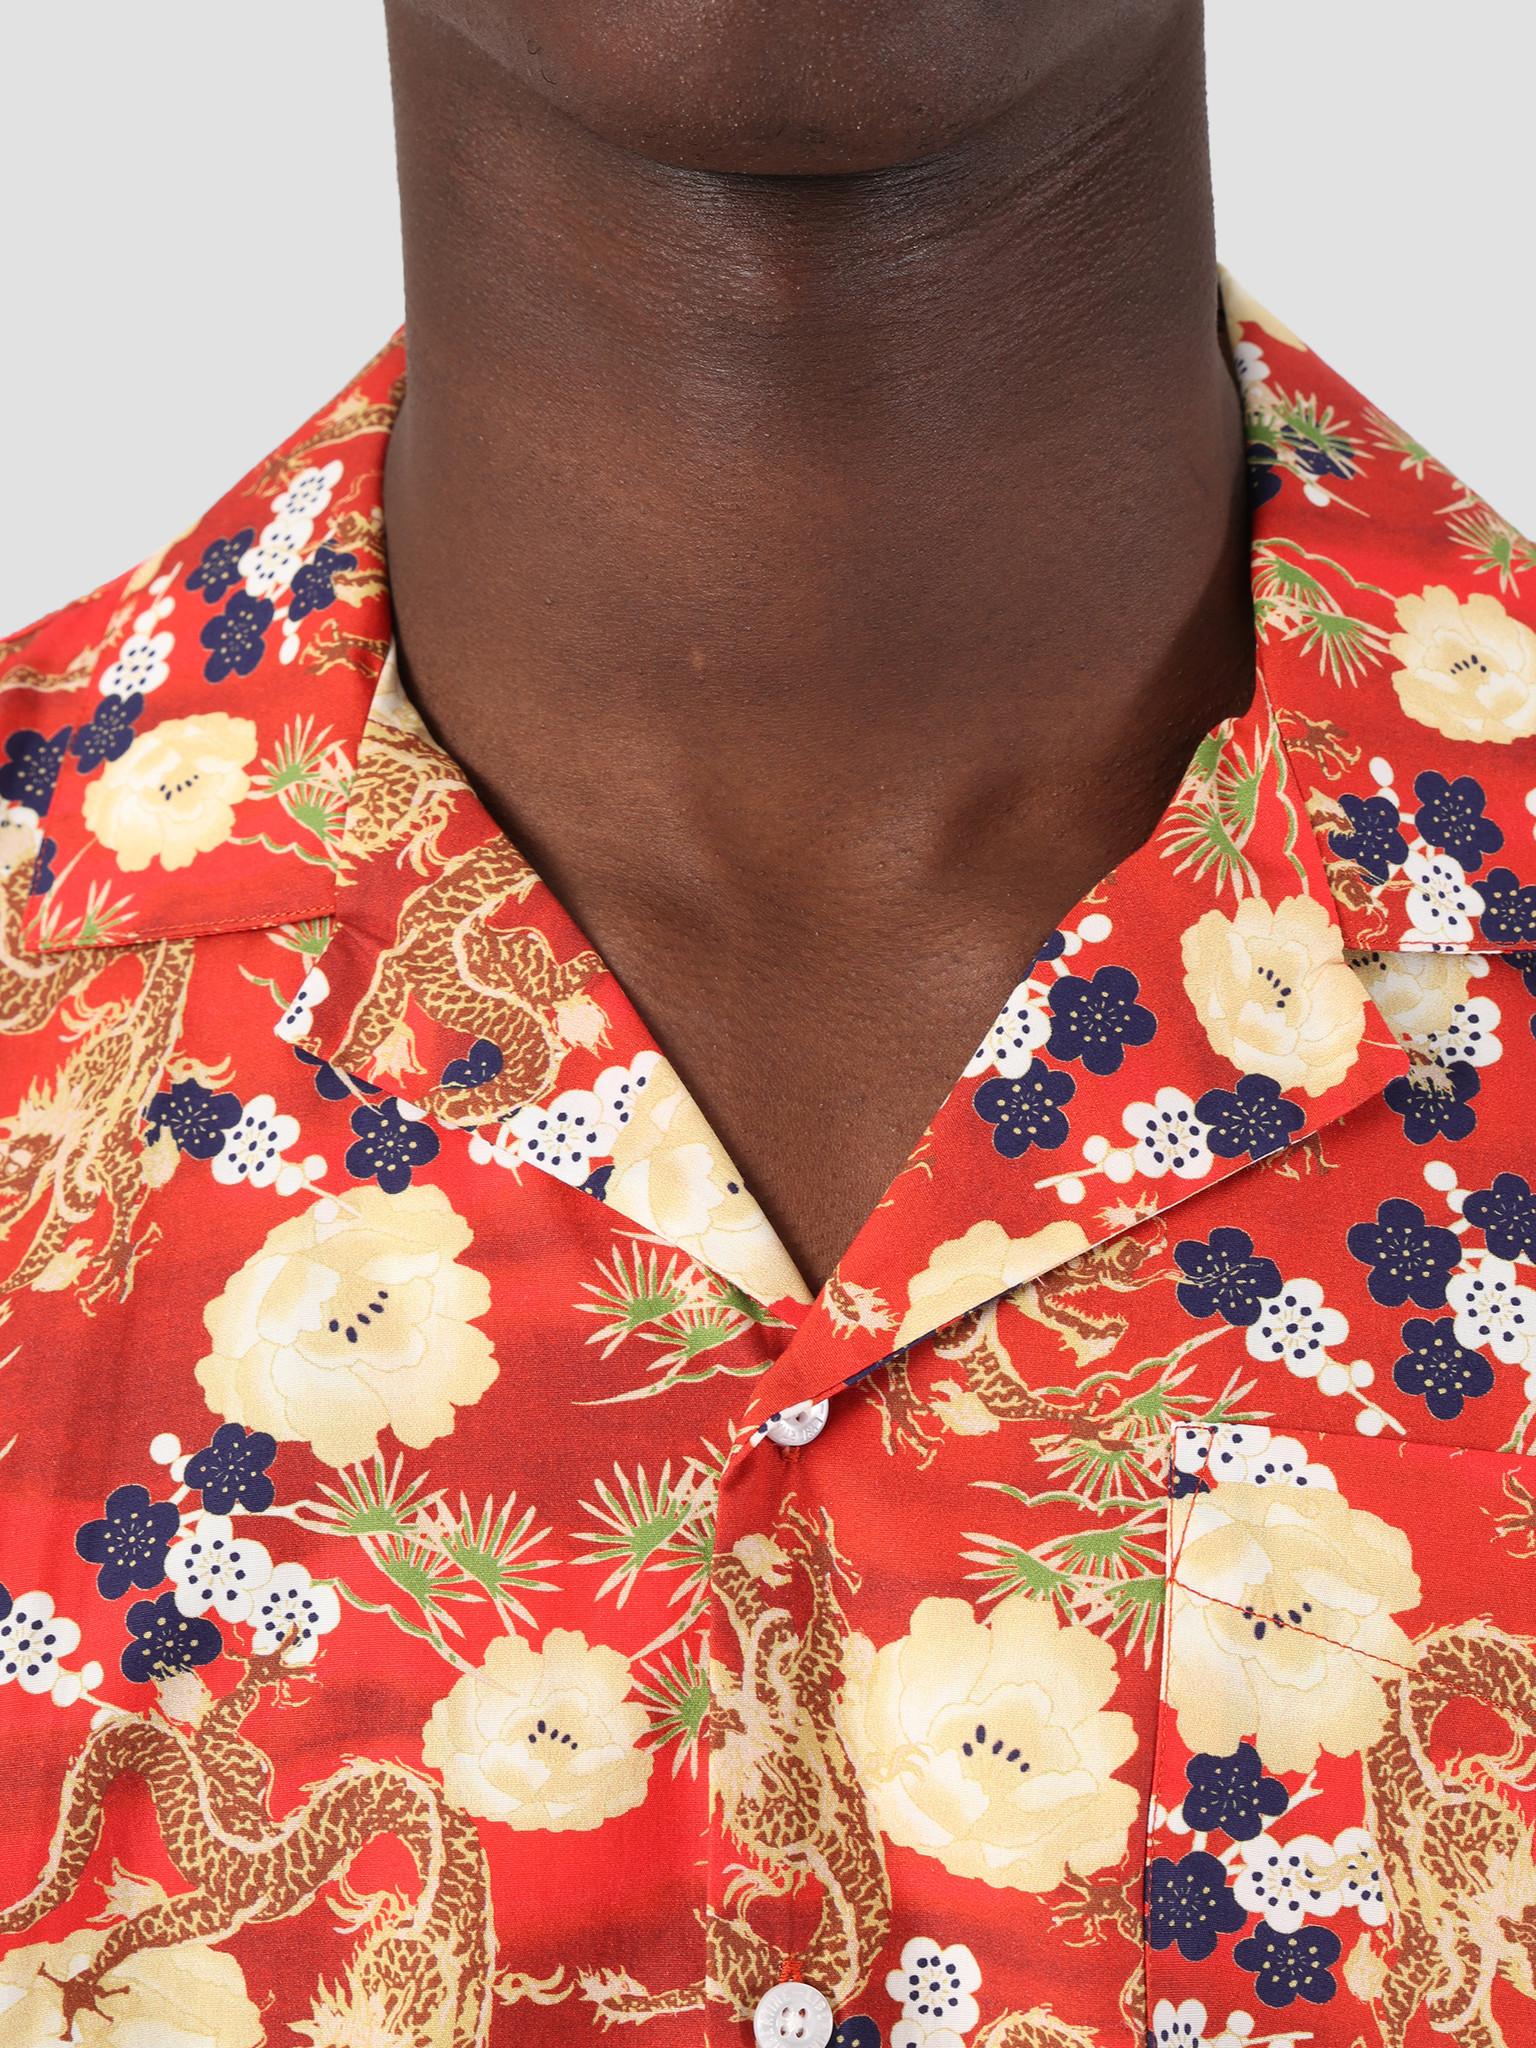 Libertine Libertine Libertine Libertine Cave Shortsleeve Shirt Red Dragon 1671